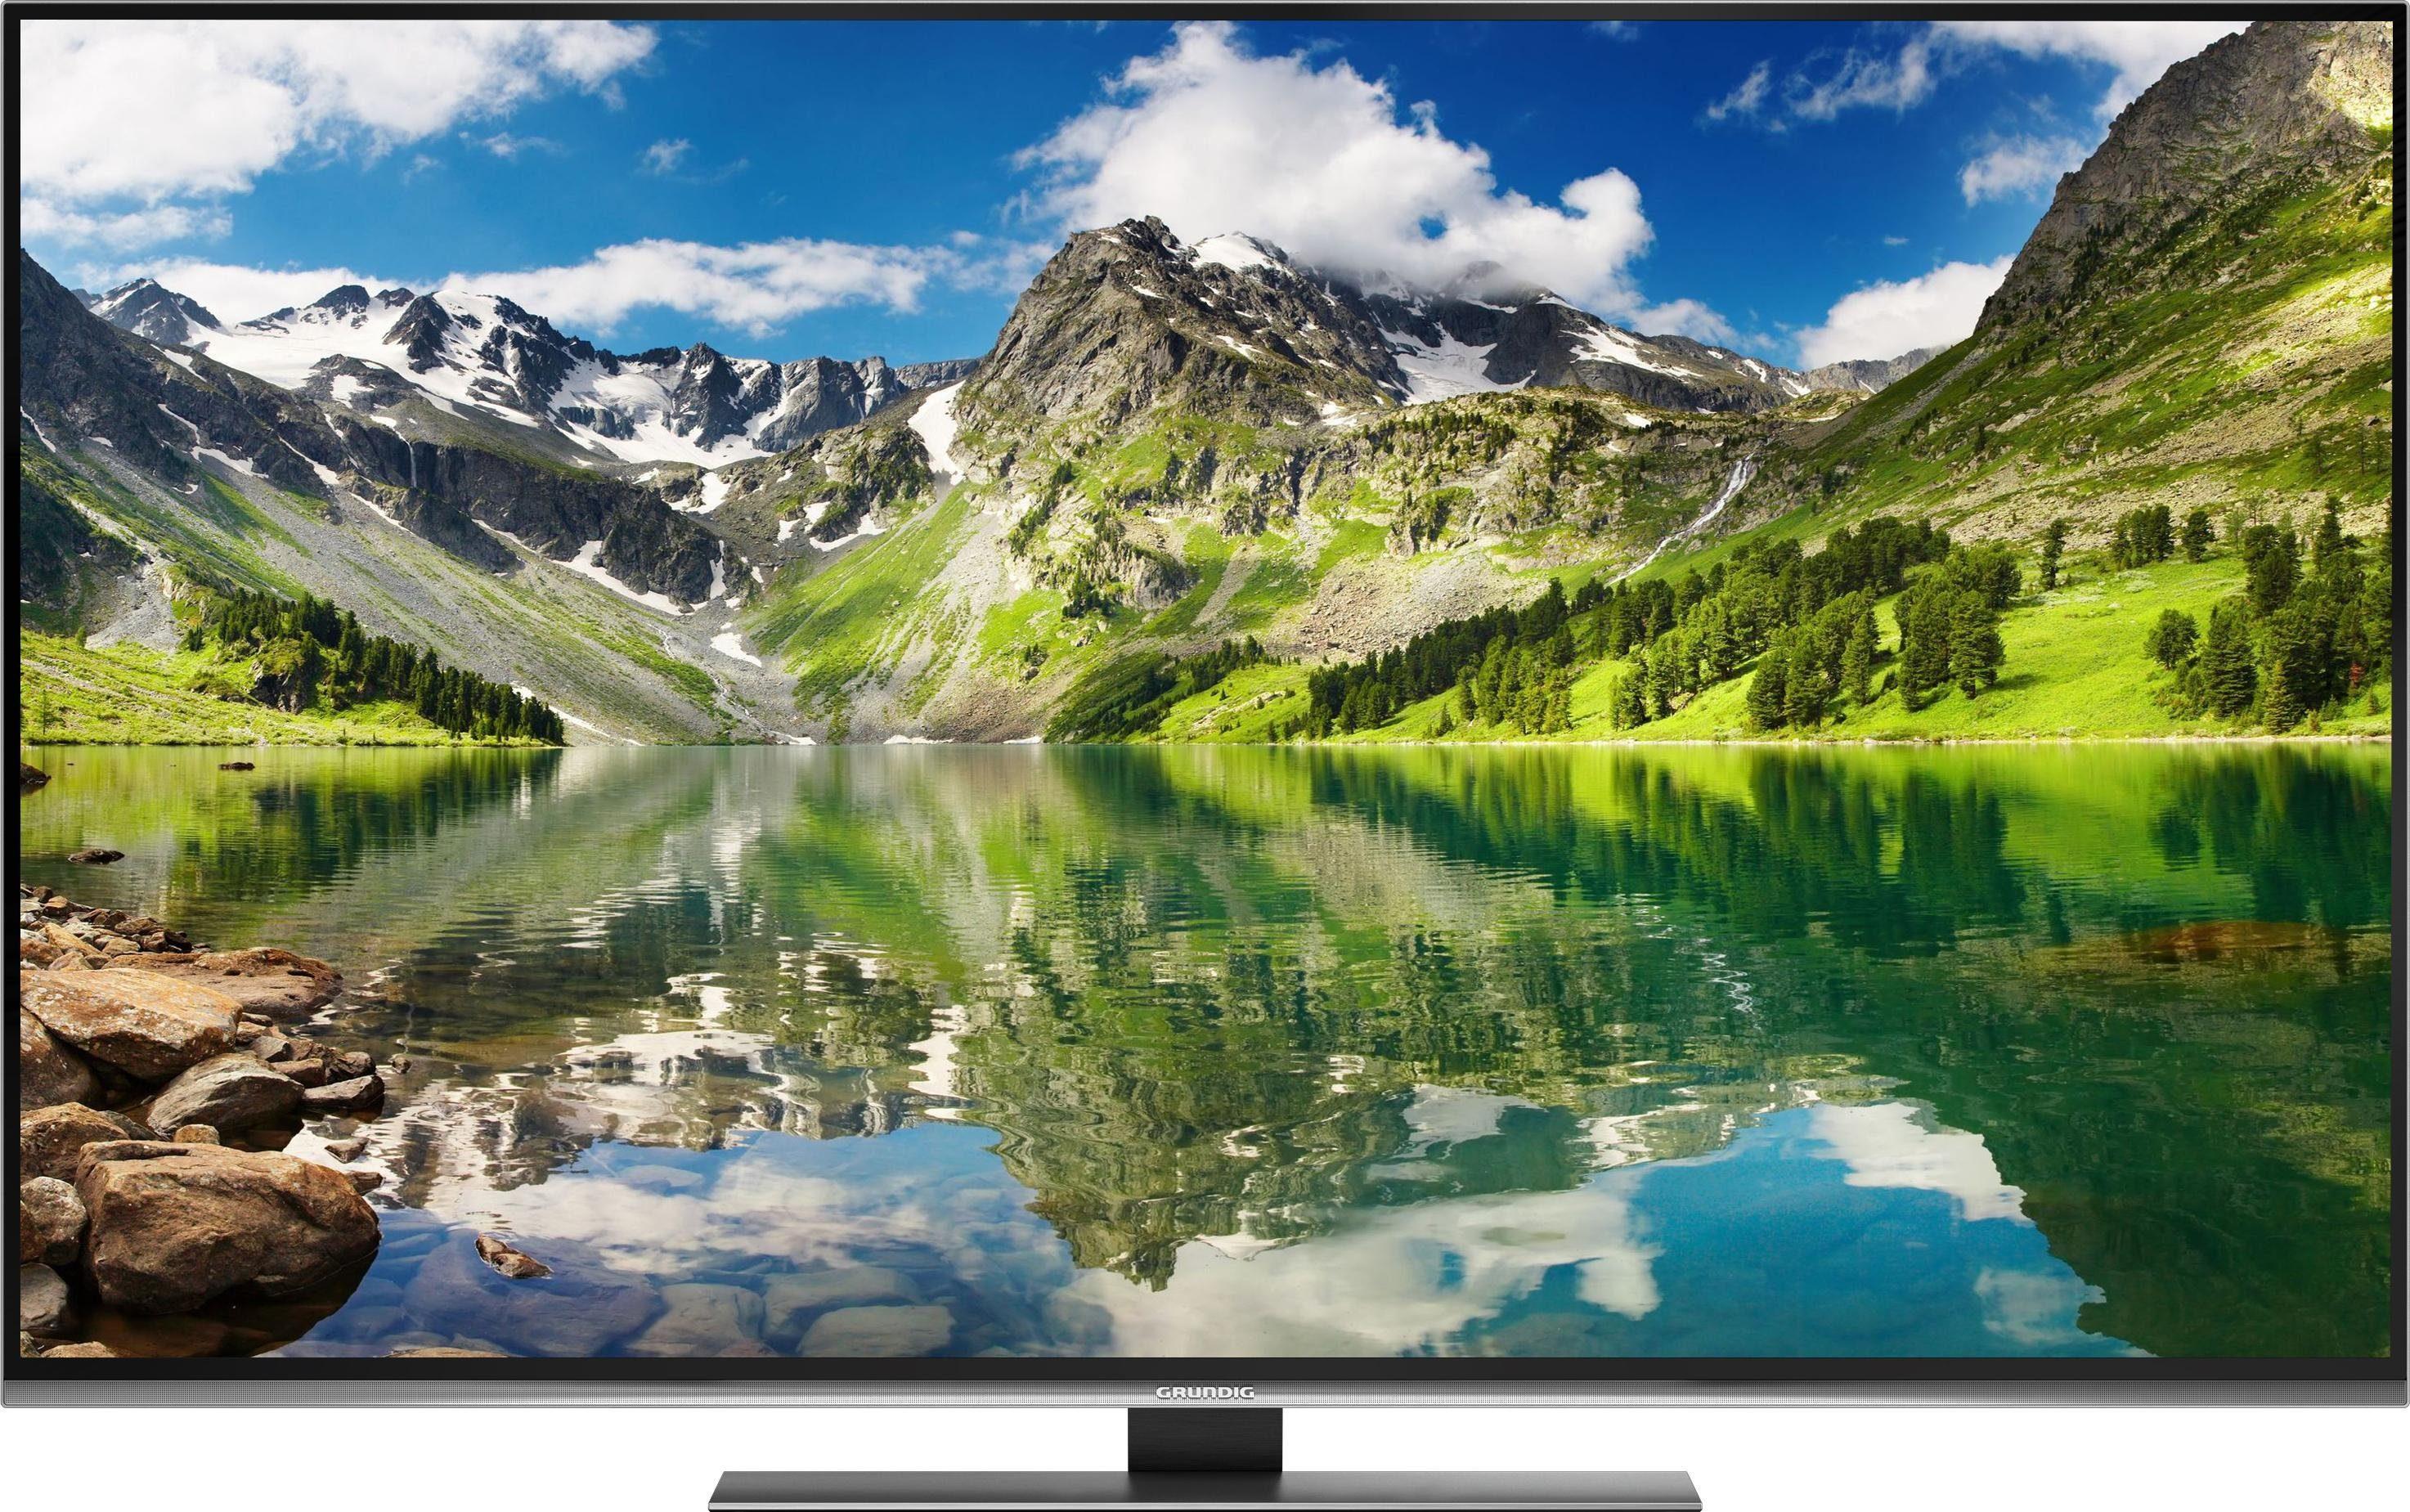 Grundig 49 GUS 9688, LED Fernseher, 123 cm (49 Zoll), 2160p (4K Ultra HD), Smart-TV